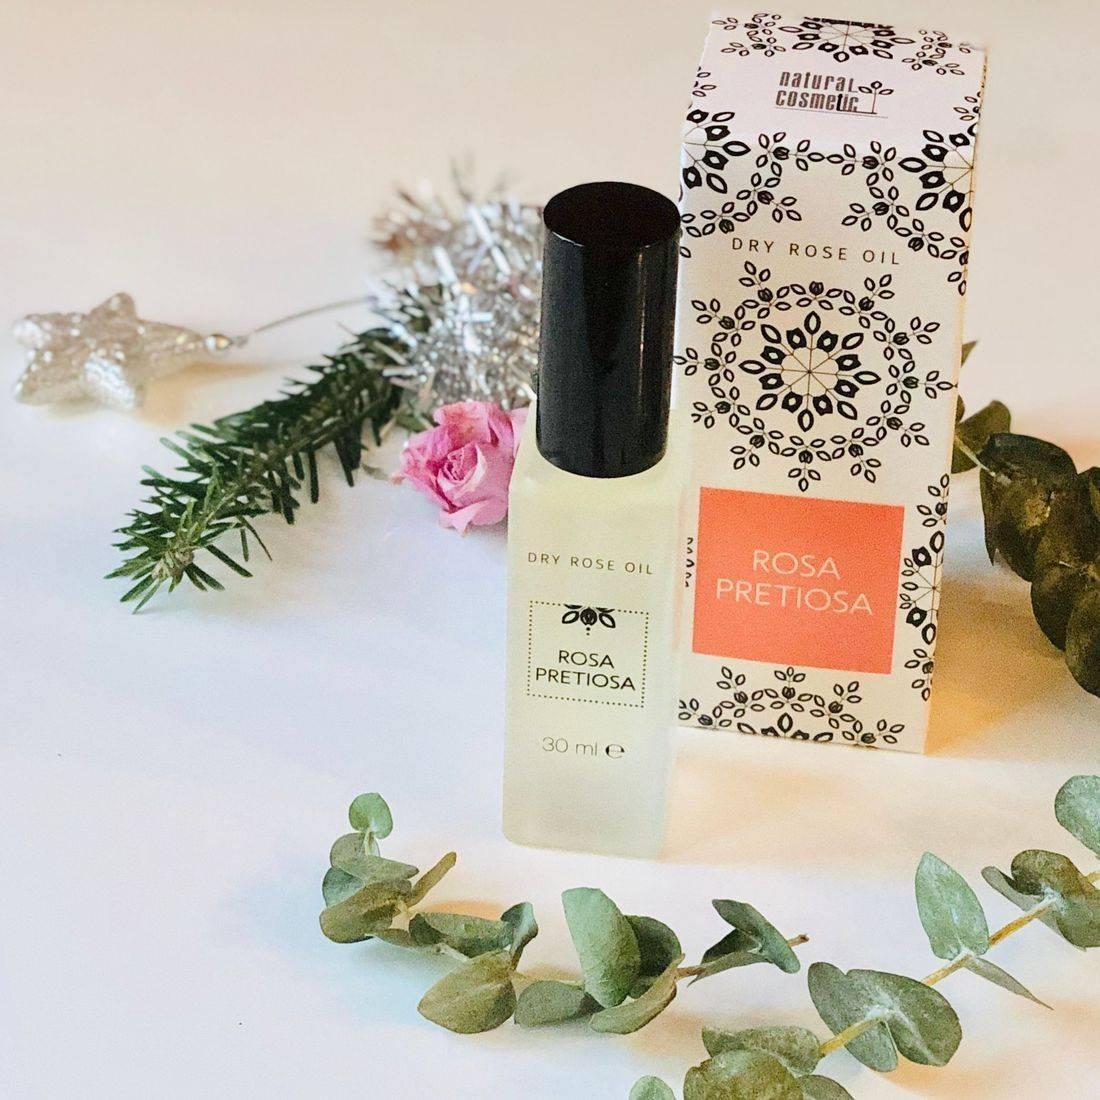 rose oil, rose face oil, clean beauty, green skincare, organic skincare